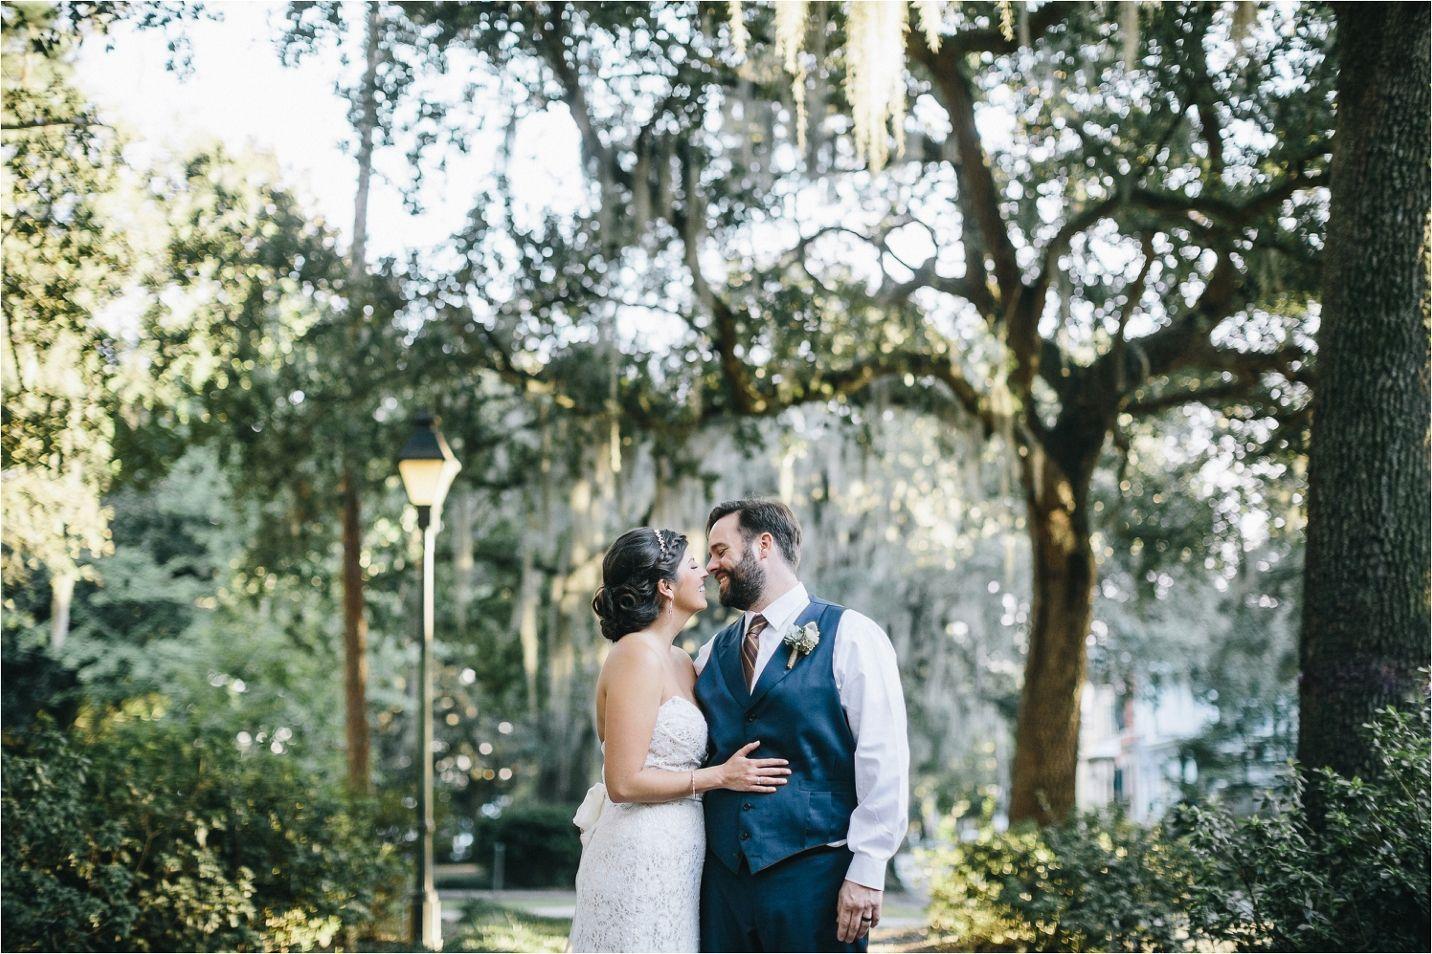 Amanda + Patrick | Real Wedding | Chatham Square, Local 11 Ten| Savannah Wedding Photographer, Wedding, Lace, Wedding Dress, Bride, Groom, Historic District, Downtown Savannah, Lace, Bouquet, Gastonian www.MackenseyAlexander.com